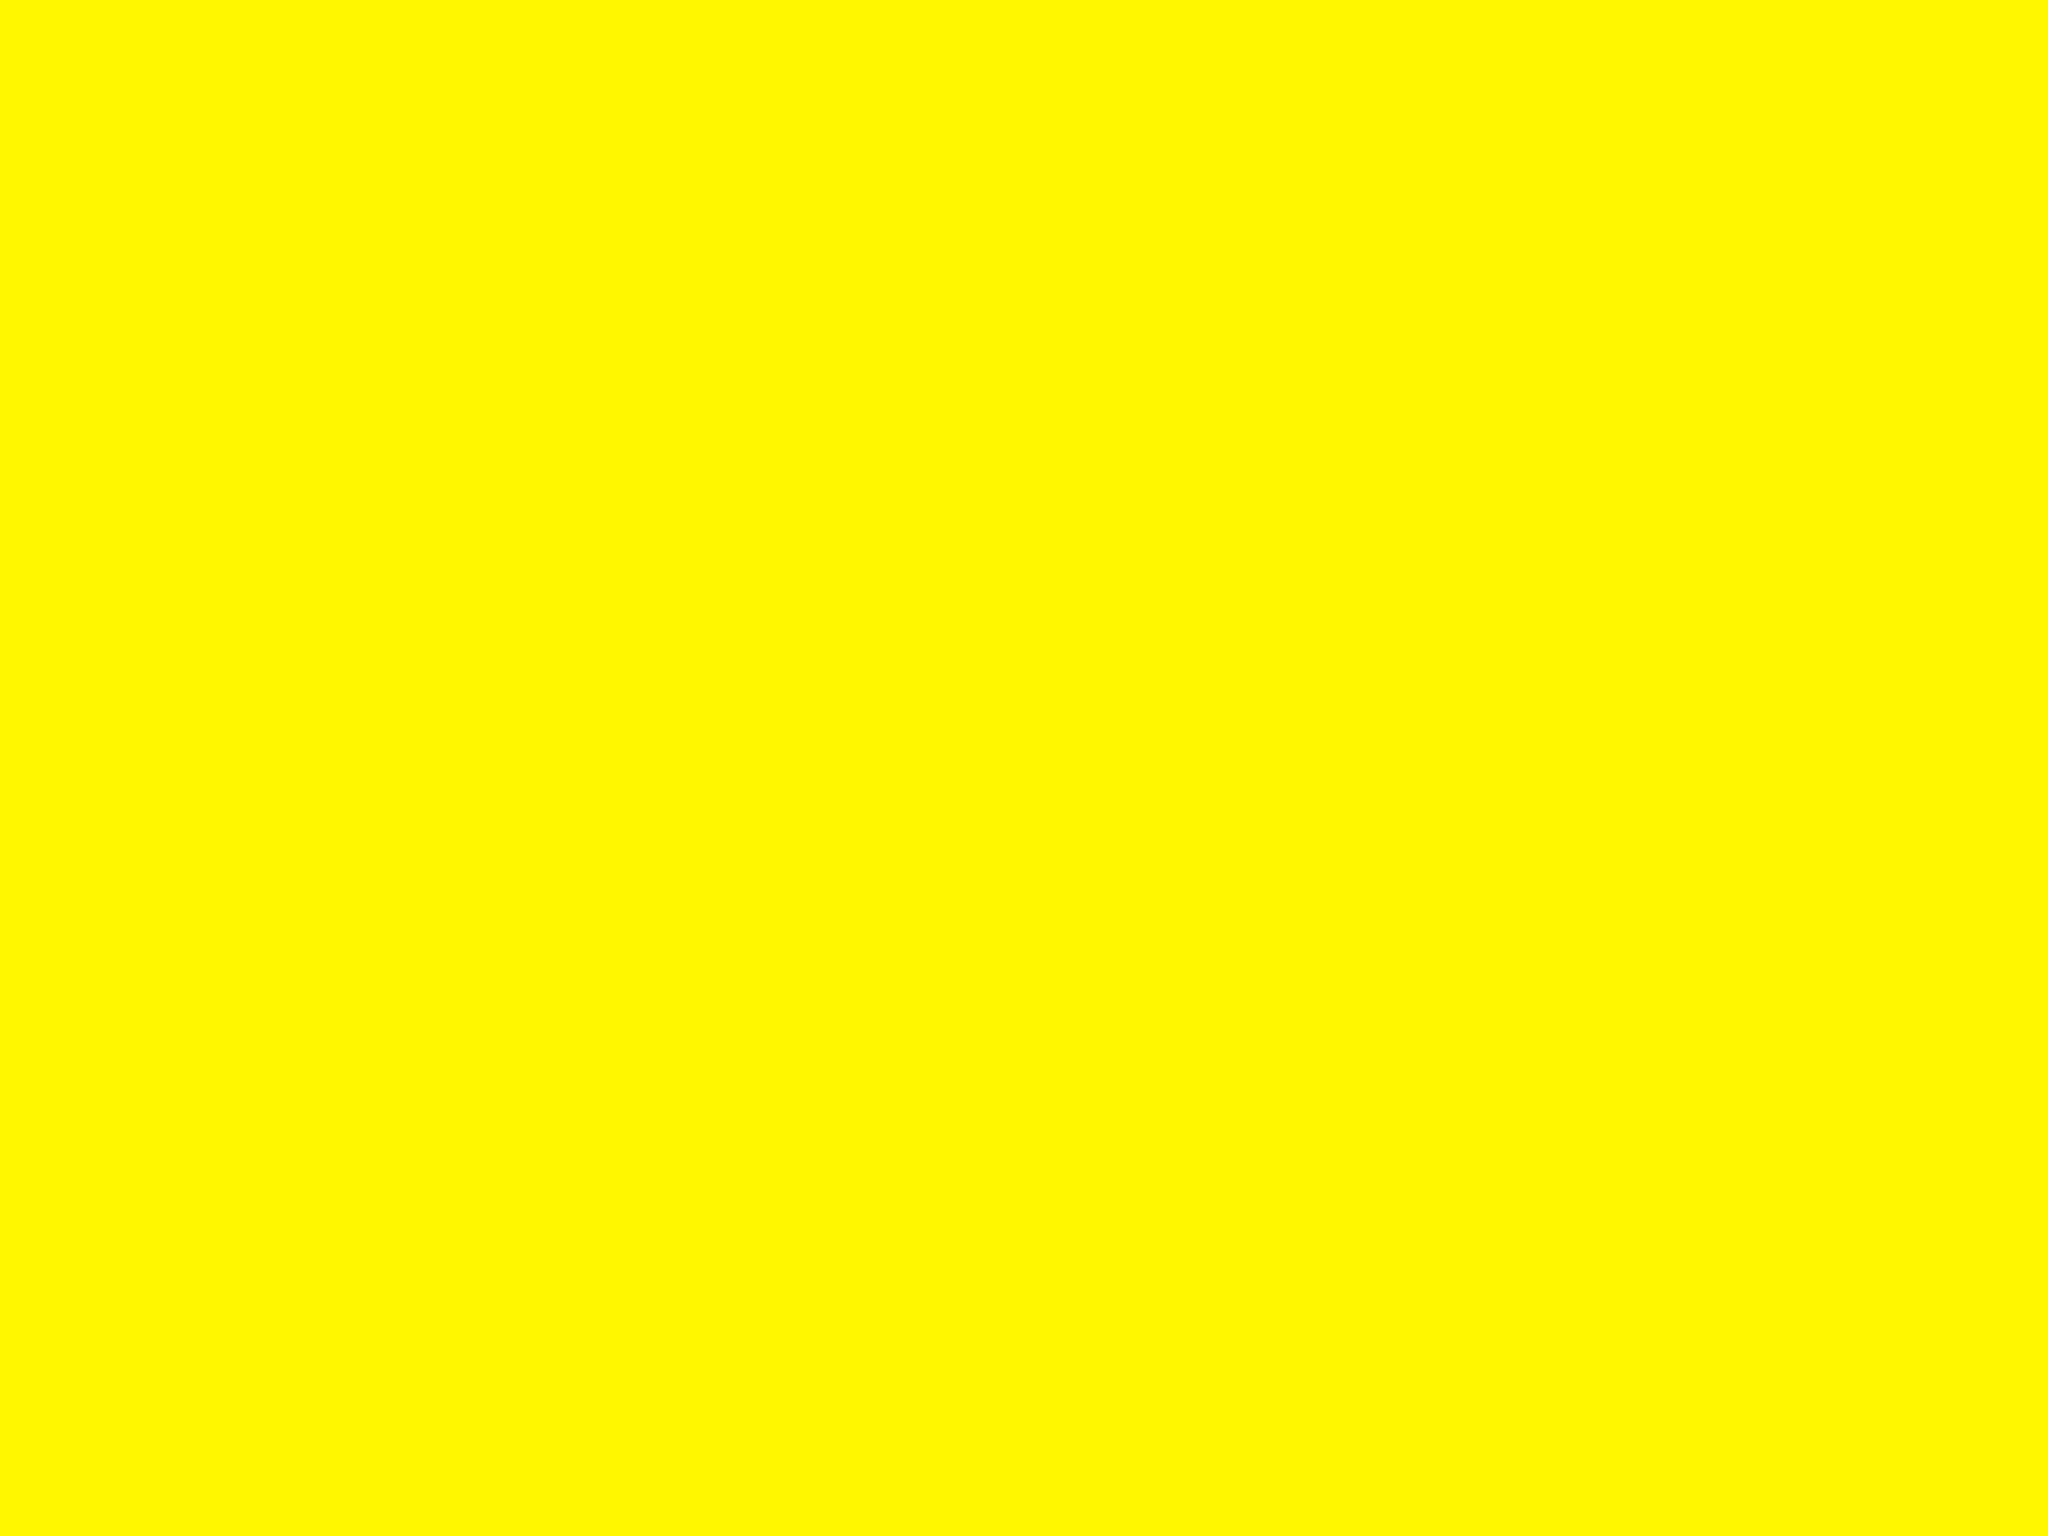 2048x1536 Lemon Solid Color Background